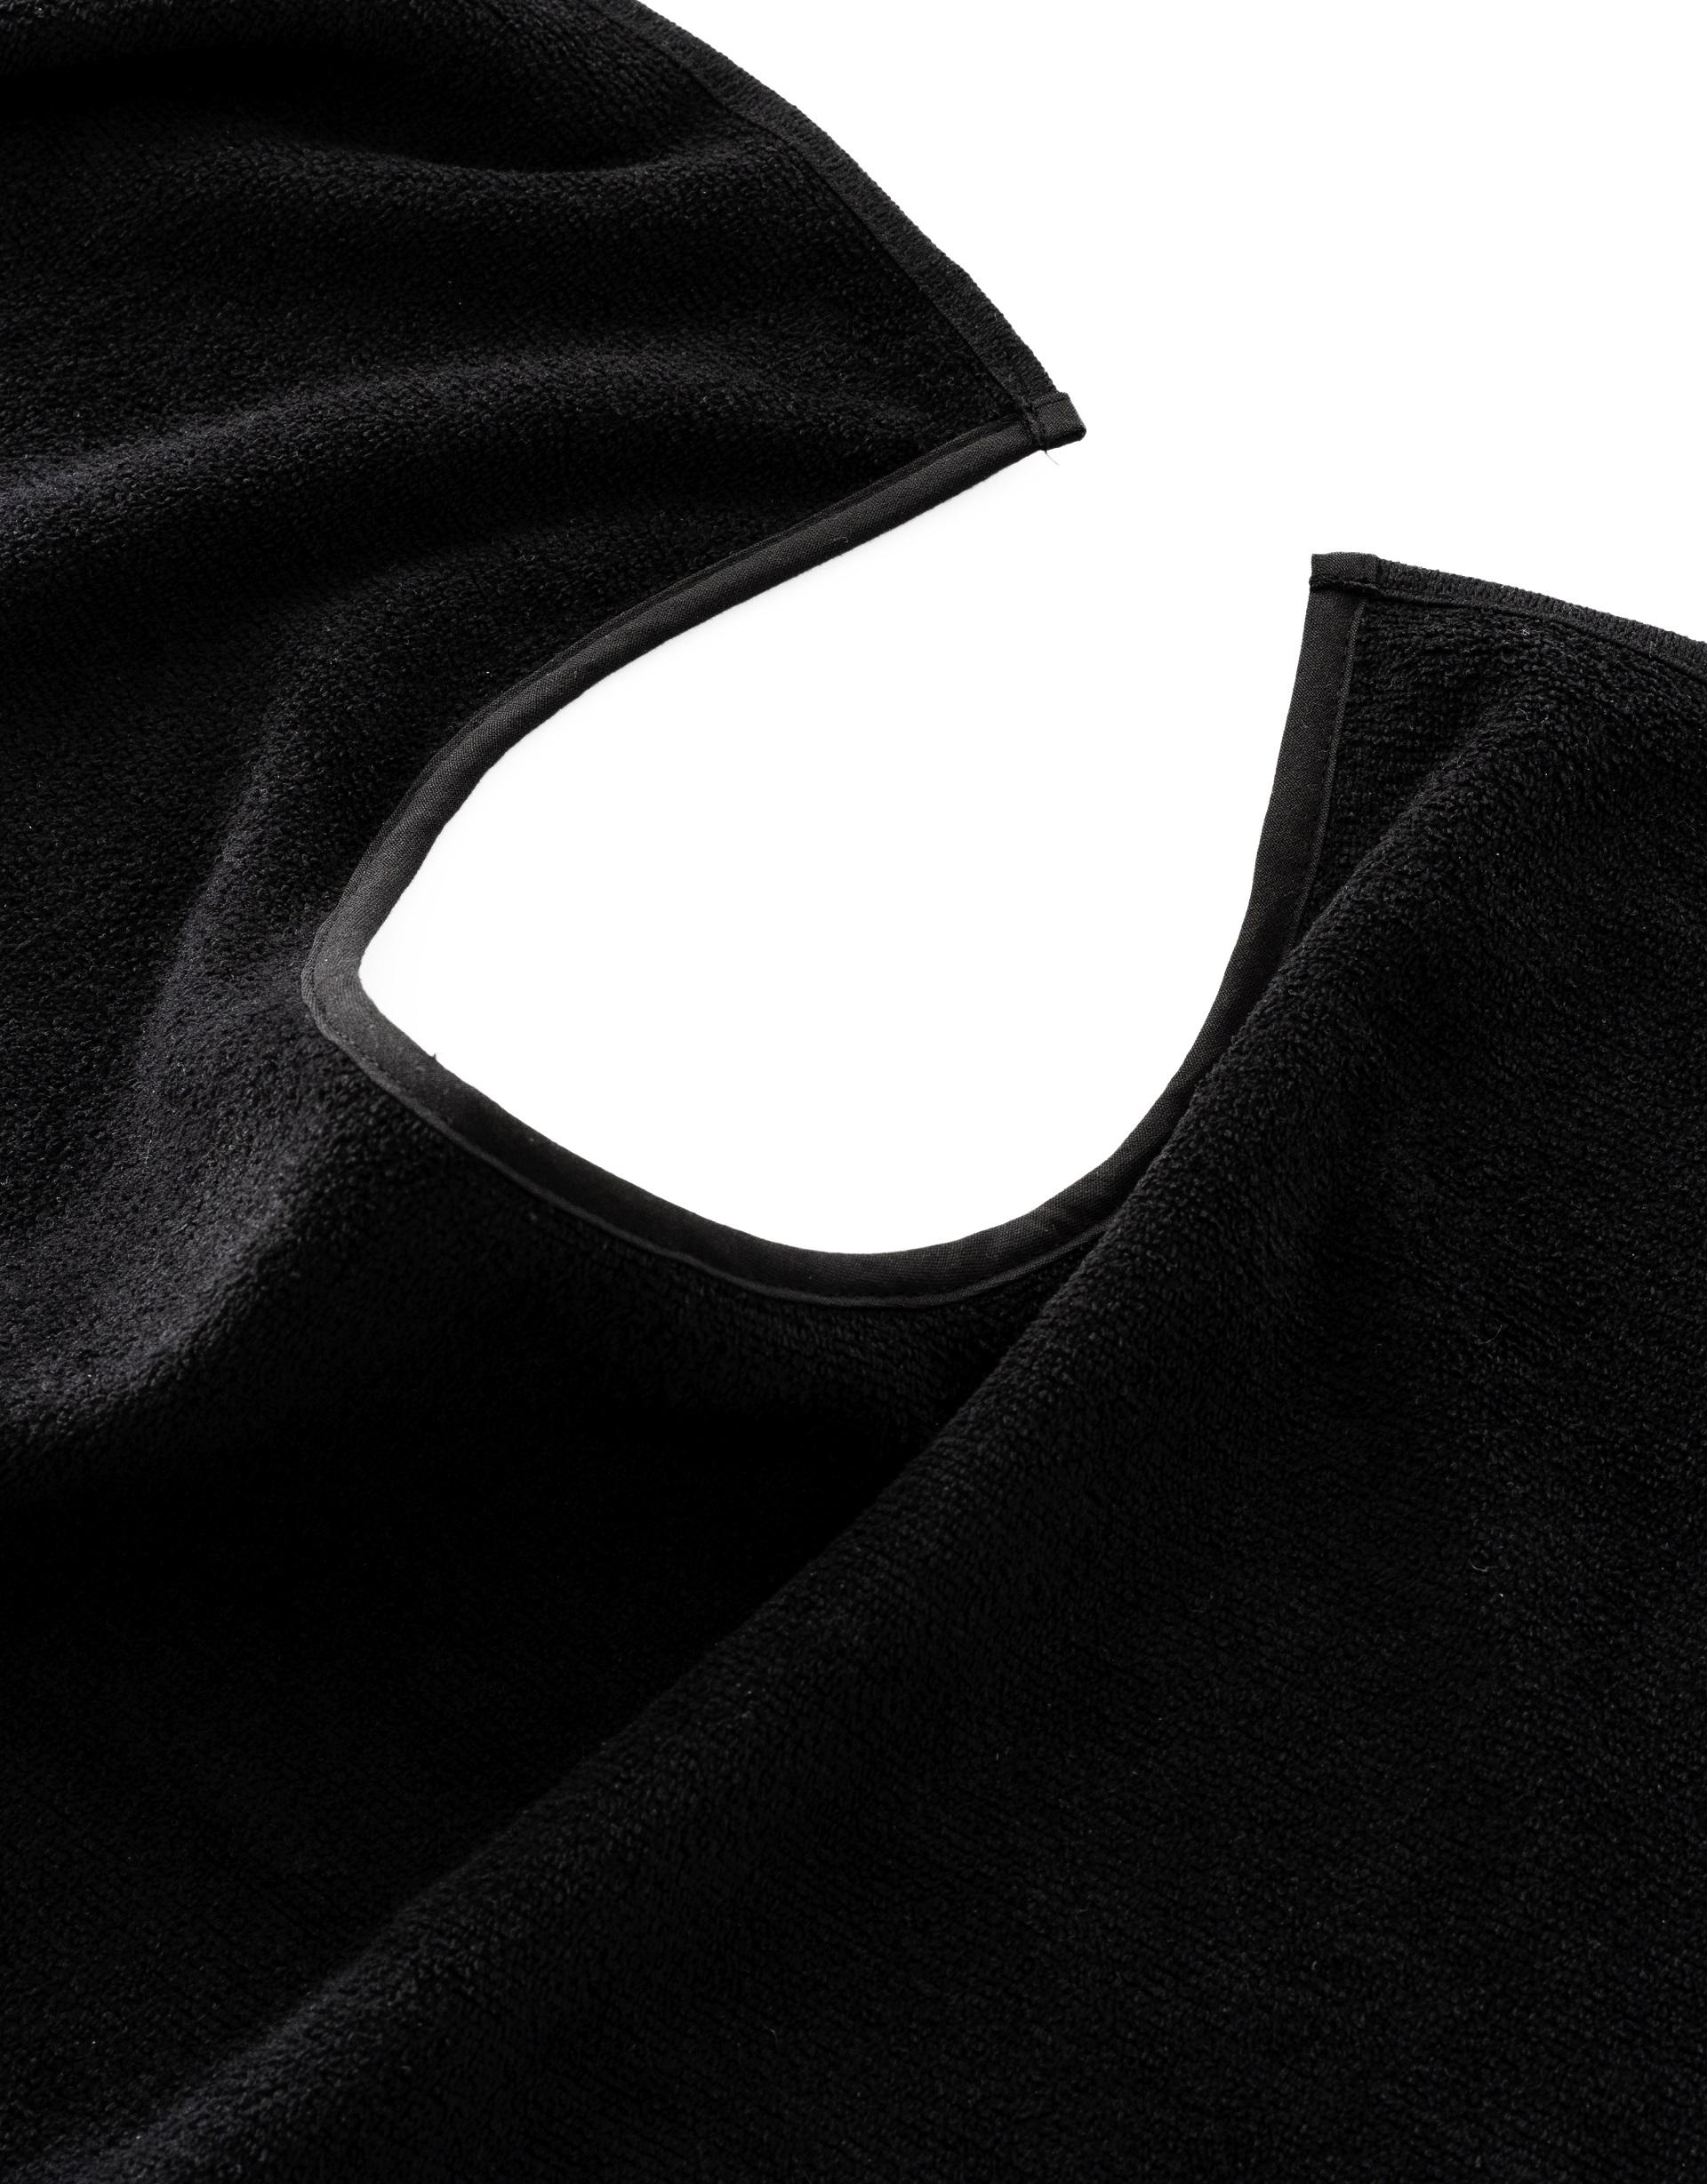 Handtücher mit Halsausschnitt schwarz